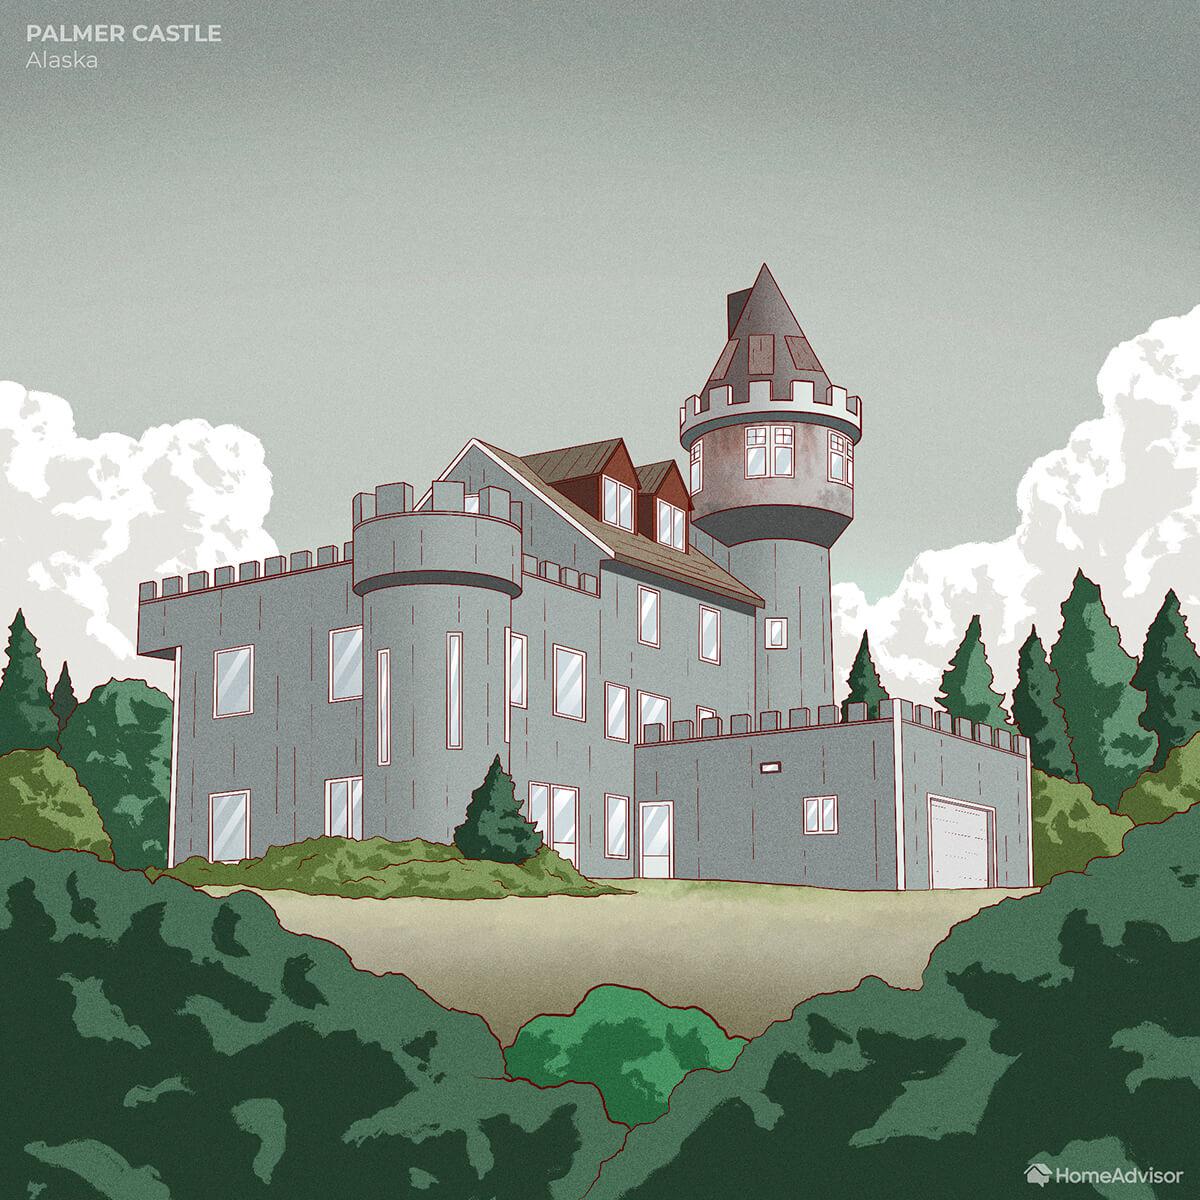 Palmer Castle